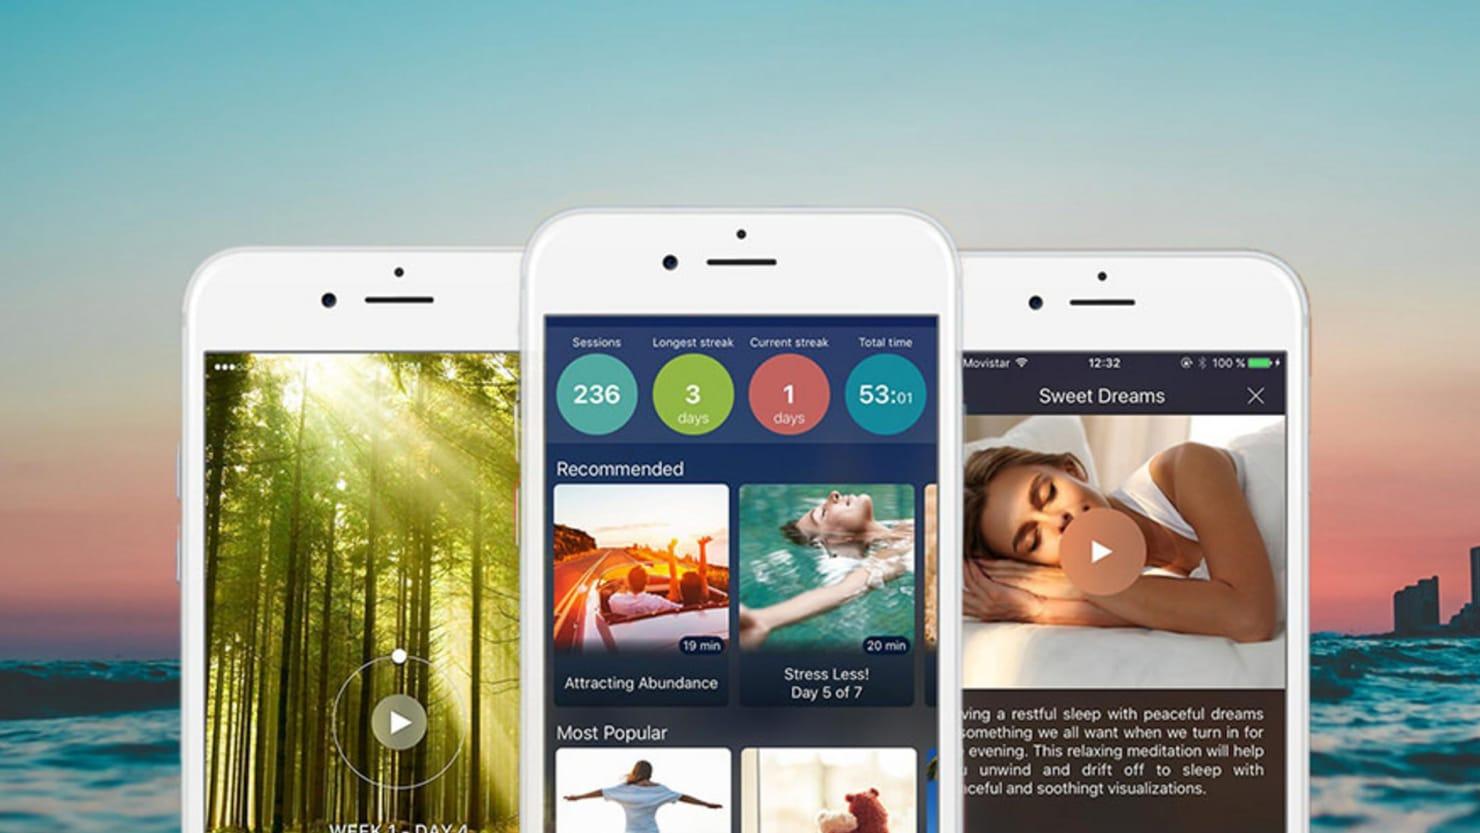 This Meditation App Can Help Improve Your Sleep Habits